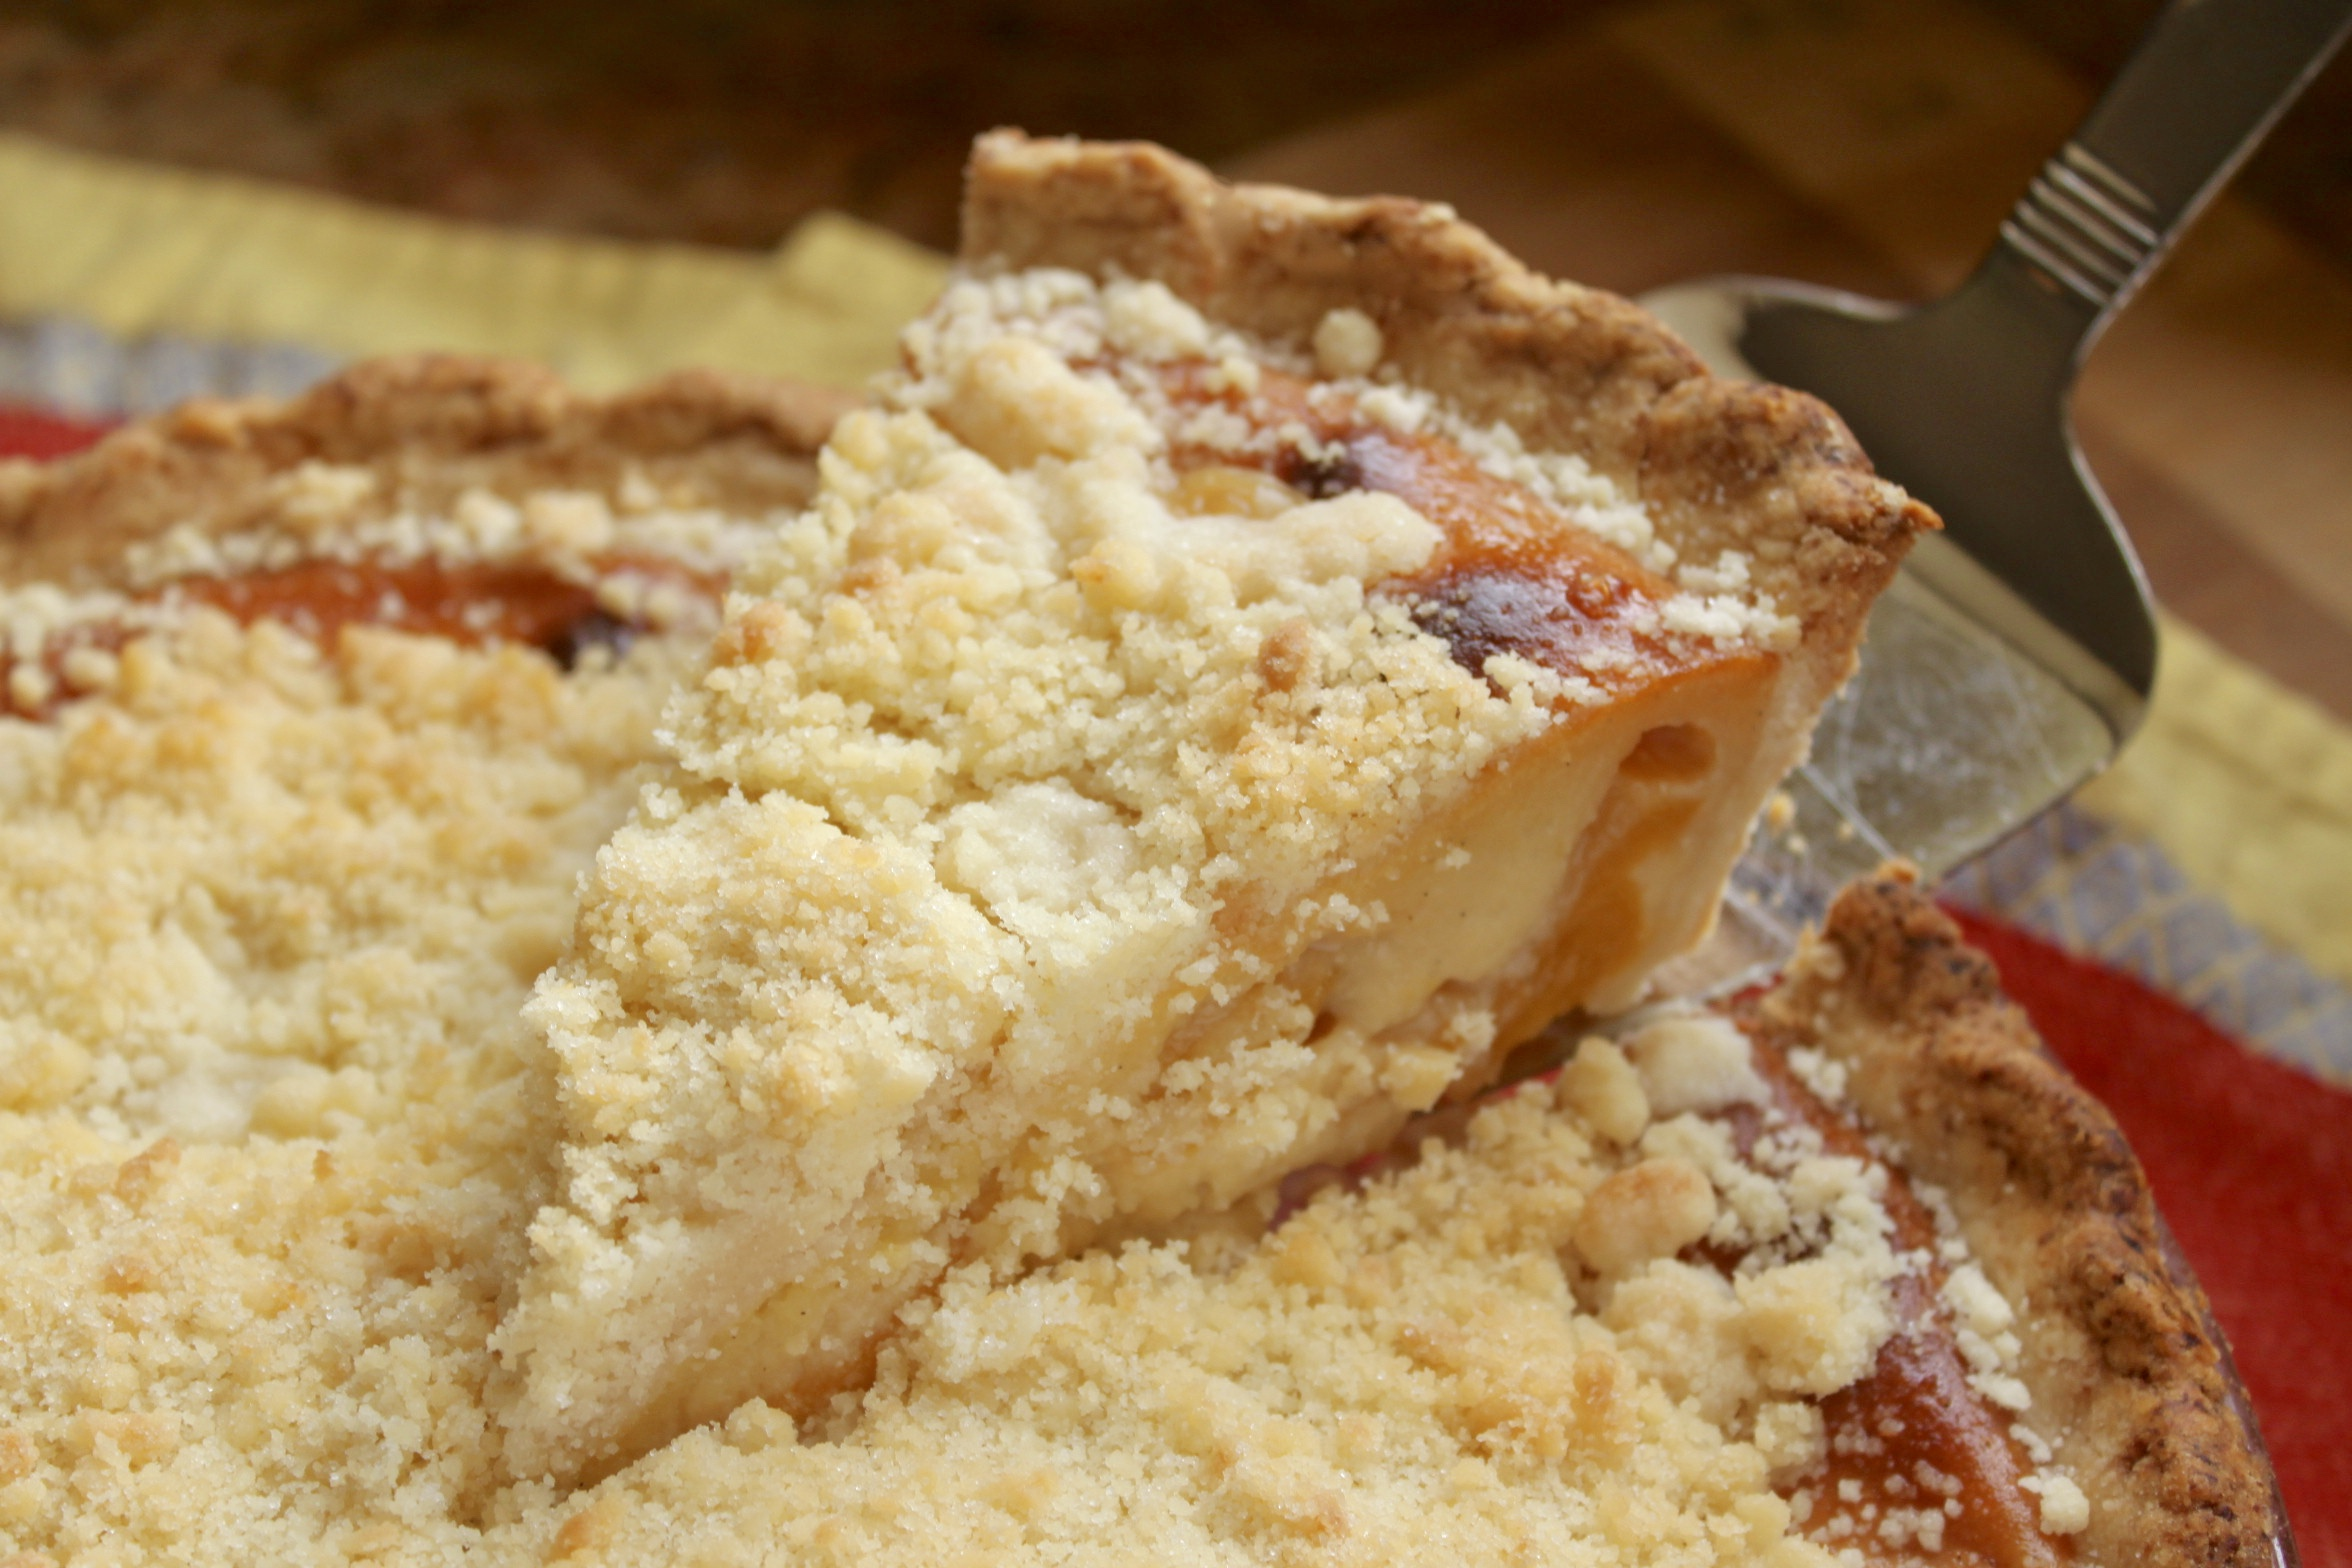 serving a slice of custard peach pie